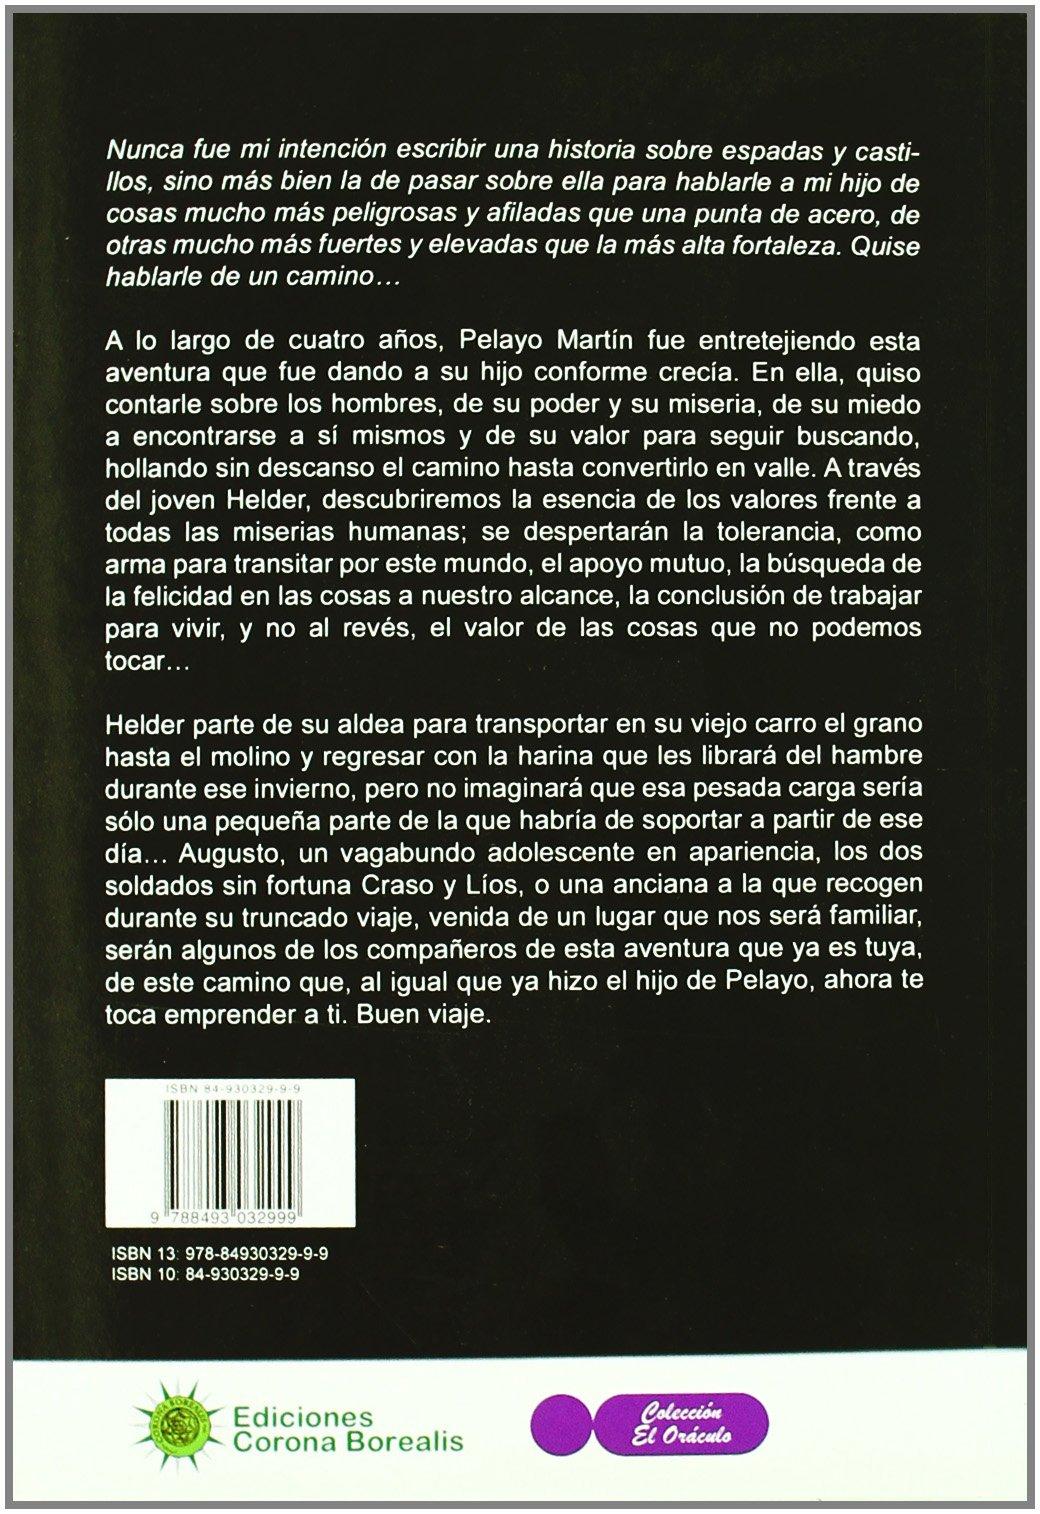 Helder (Spanish Edition): Pelayo Martín: 9788493032999: Amazon.com: Books